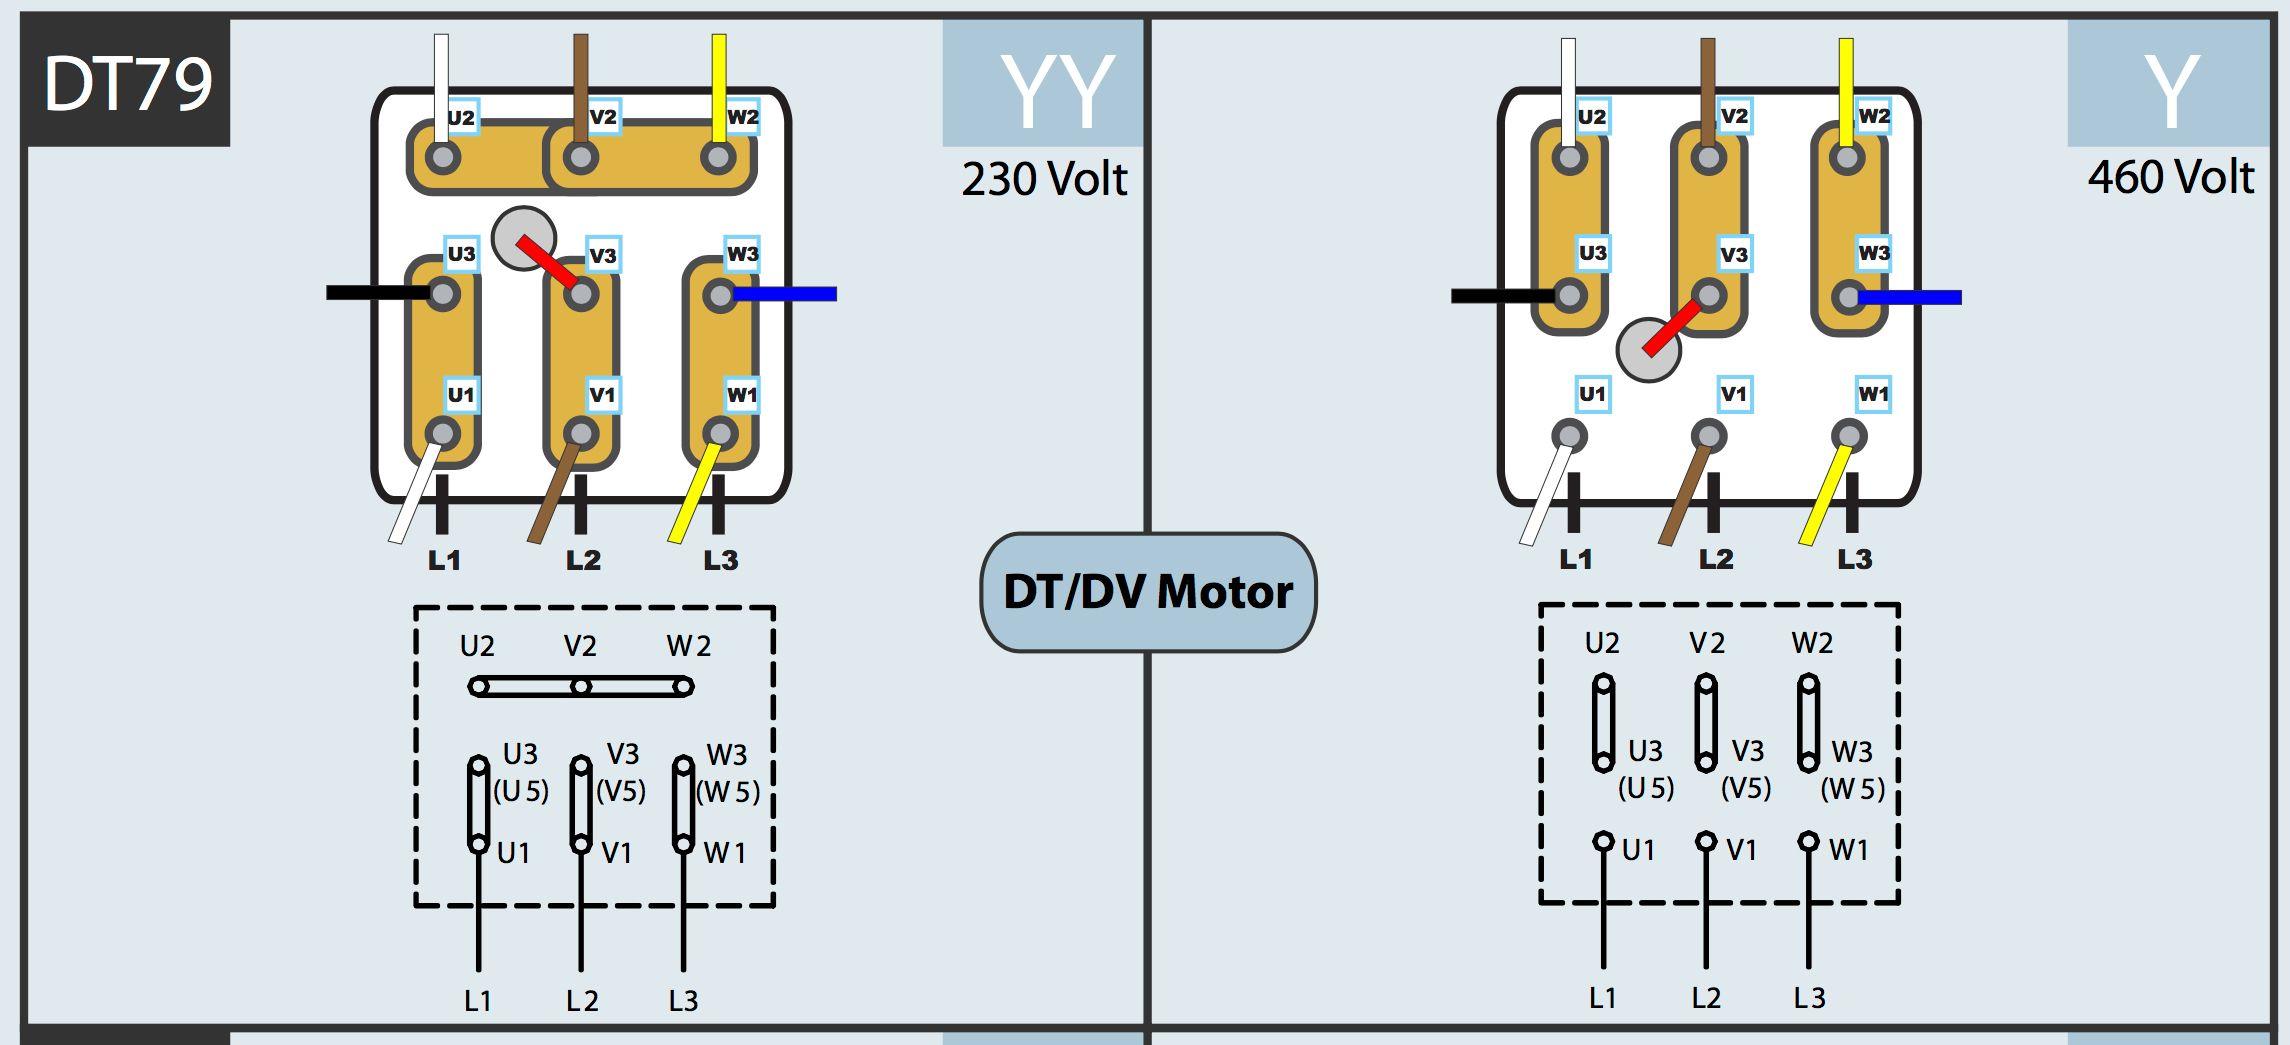 [DIAGRAM_34OR]  dt79.jpg (2290×1045) | Diagram, Connection, Motor | Le Motor Wiring Diagram |  | Pinterest